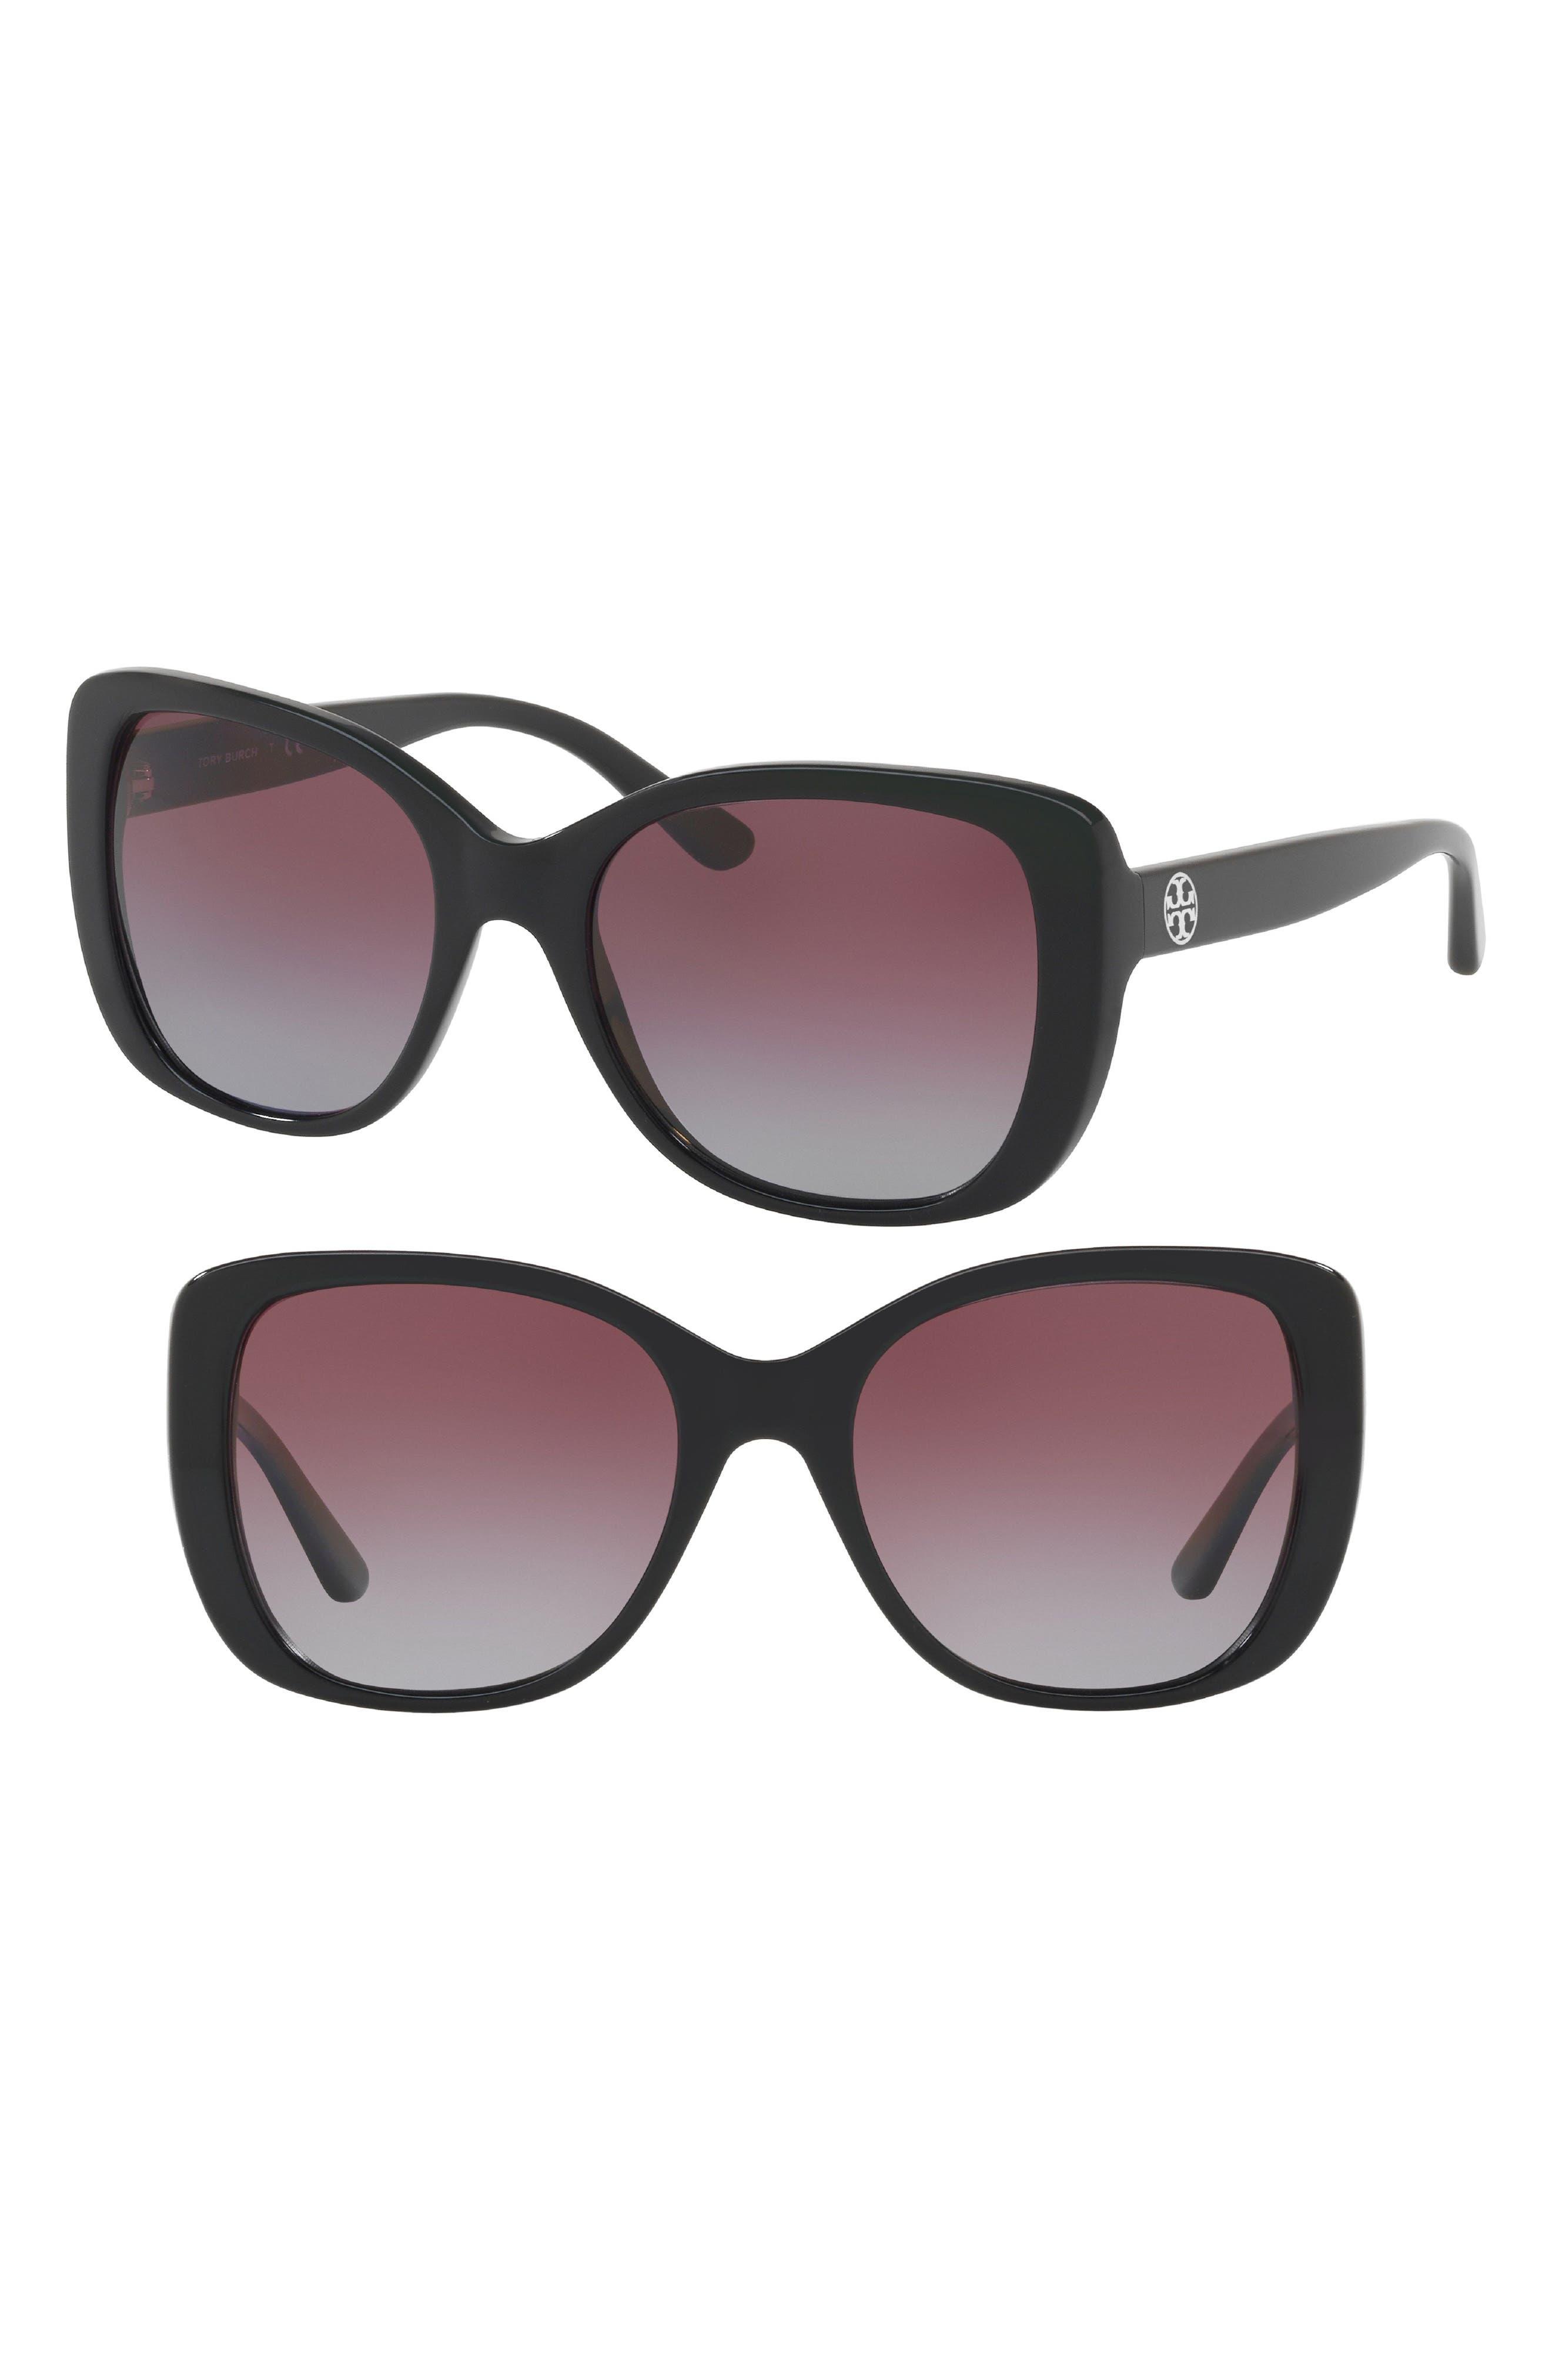 53mm Polarized Rectangle Sunglasses,                         Main,                         color, 008